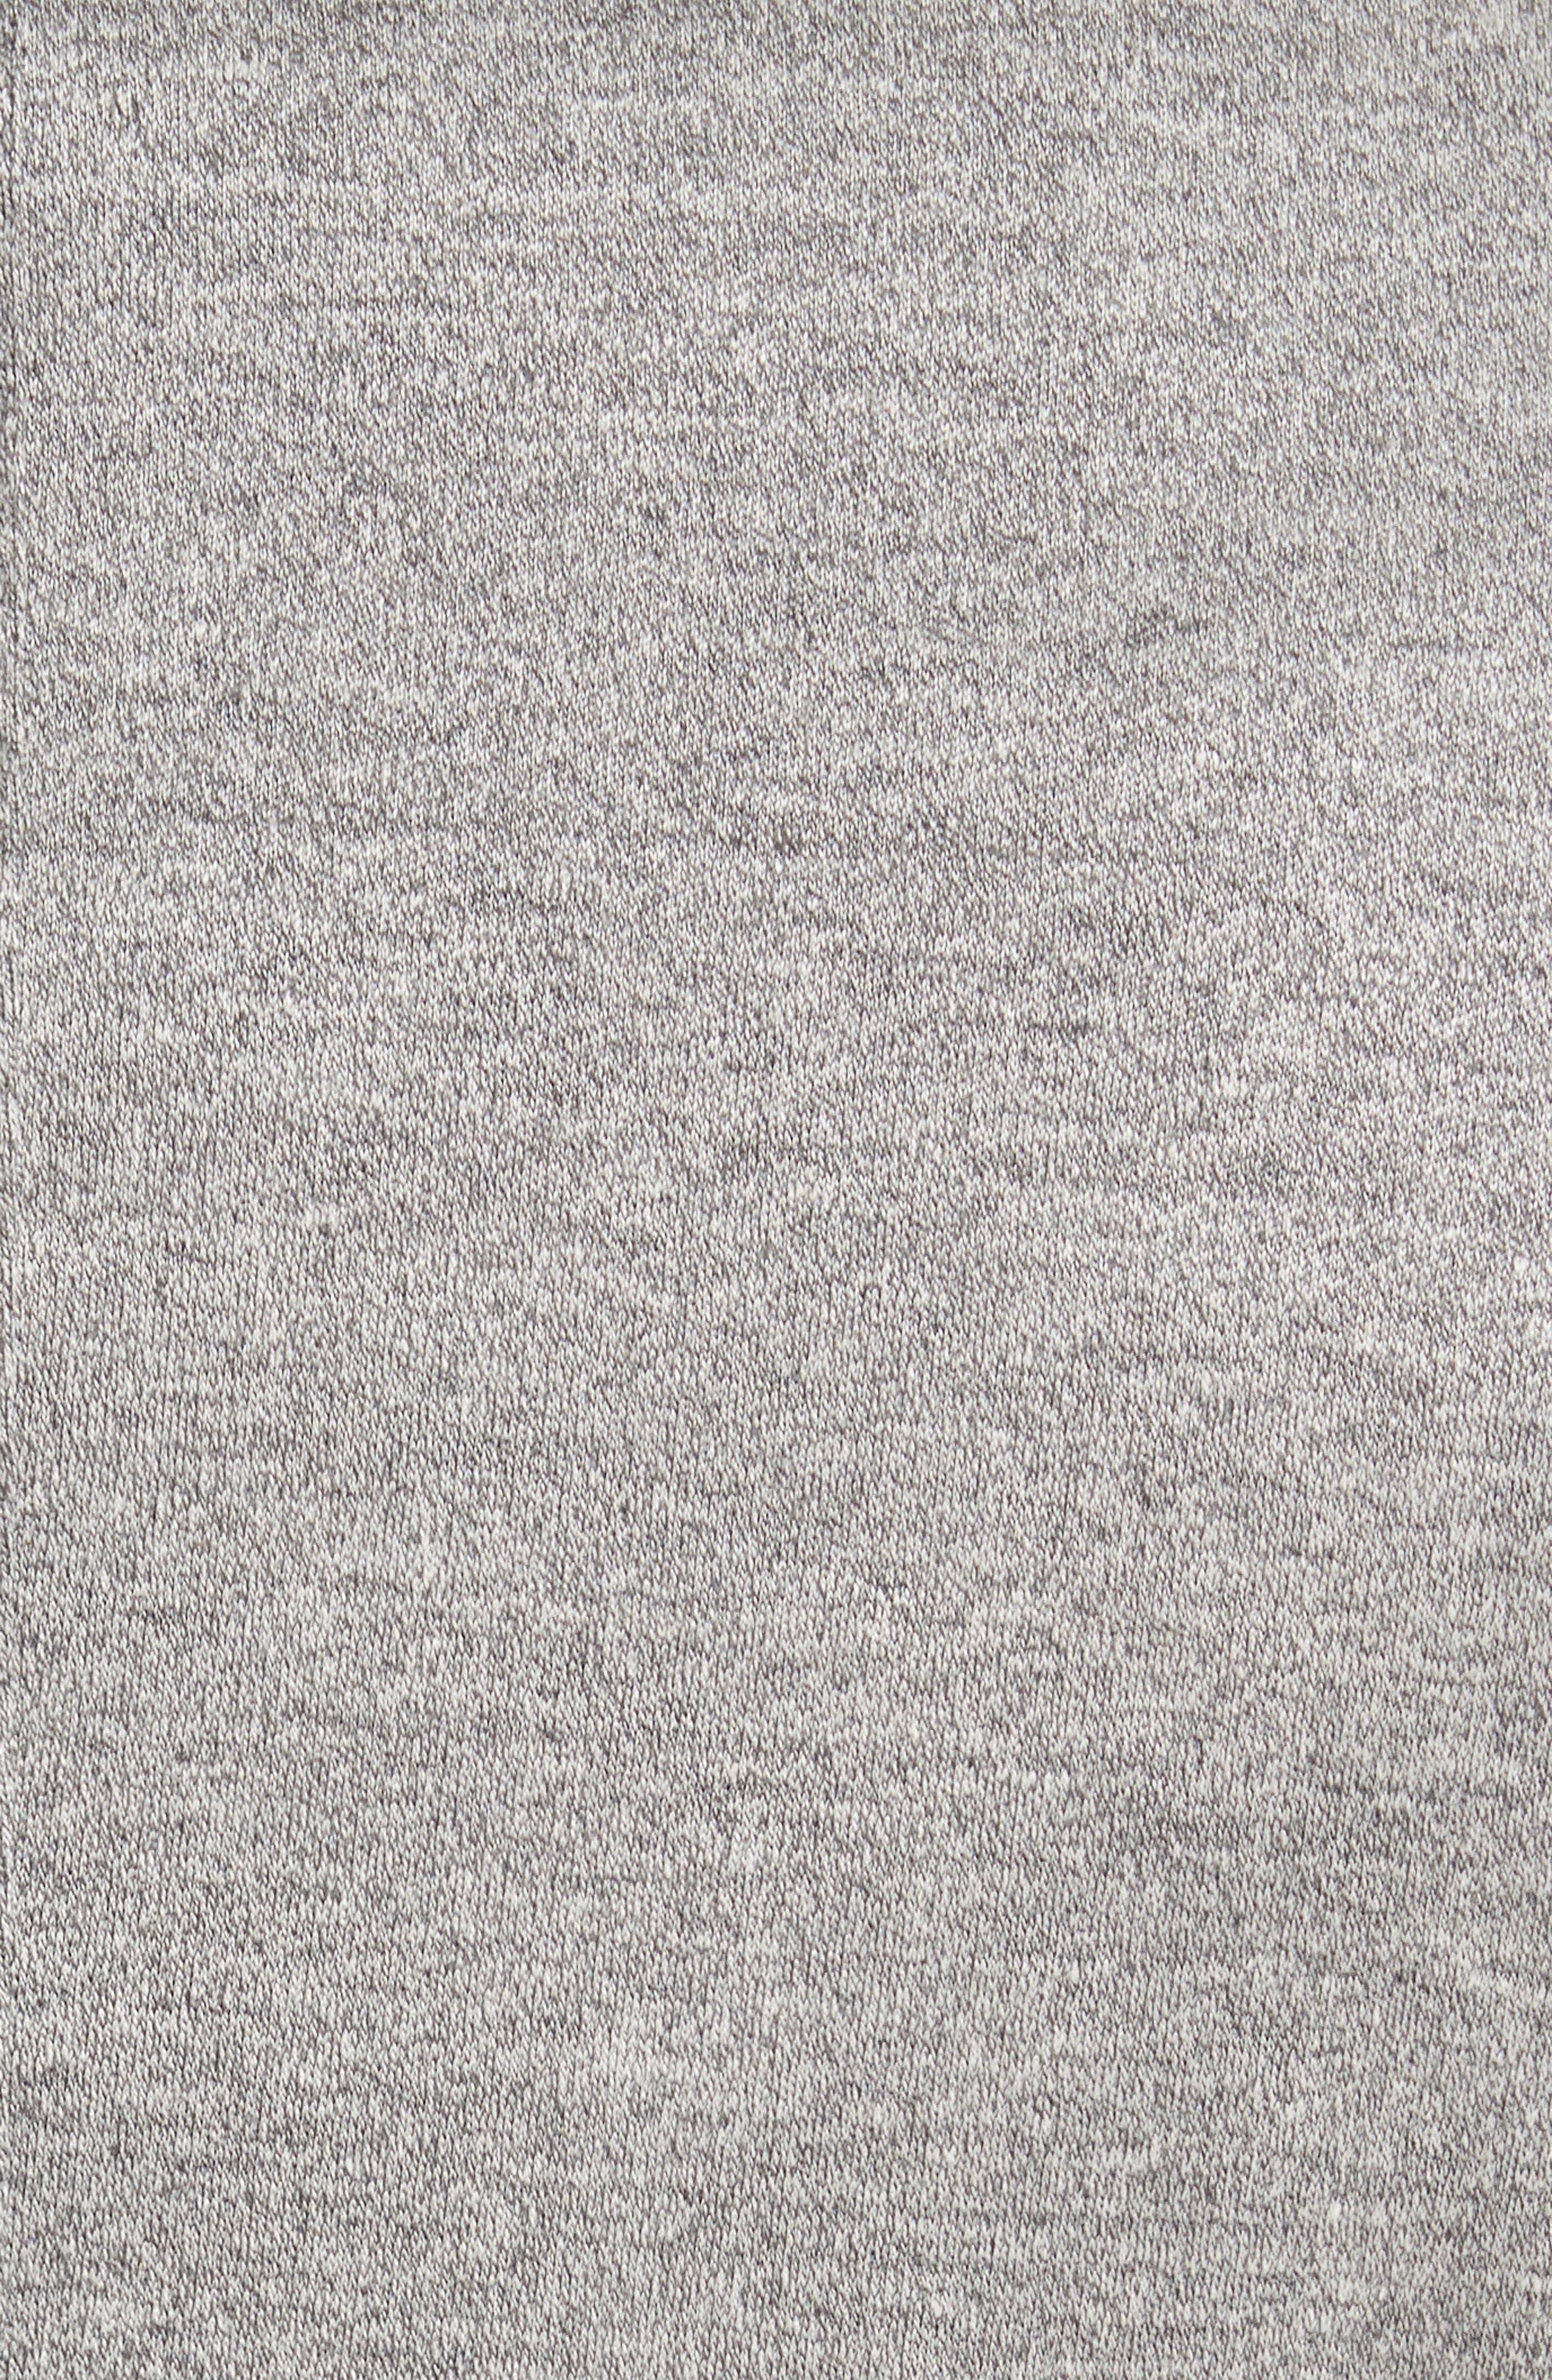 Trim Fit Washed Jersey Jacket,                             Alternate thumbnail 6, color,                             050